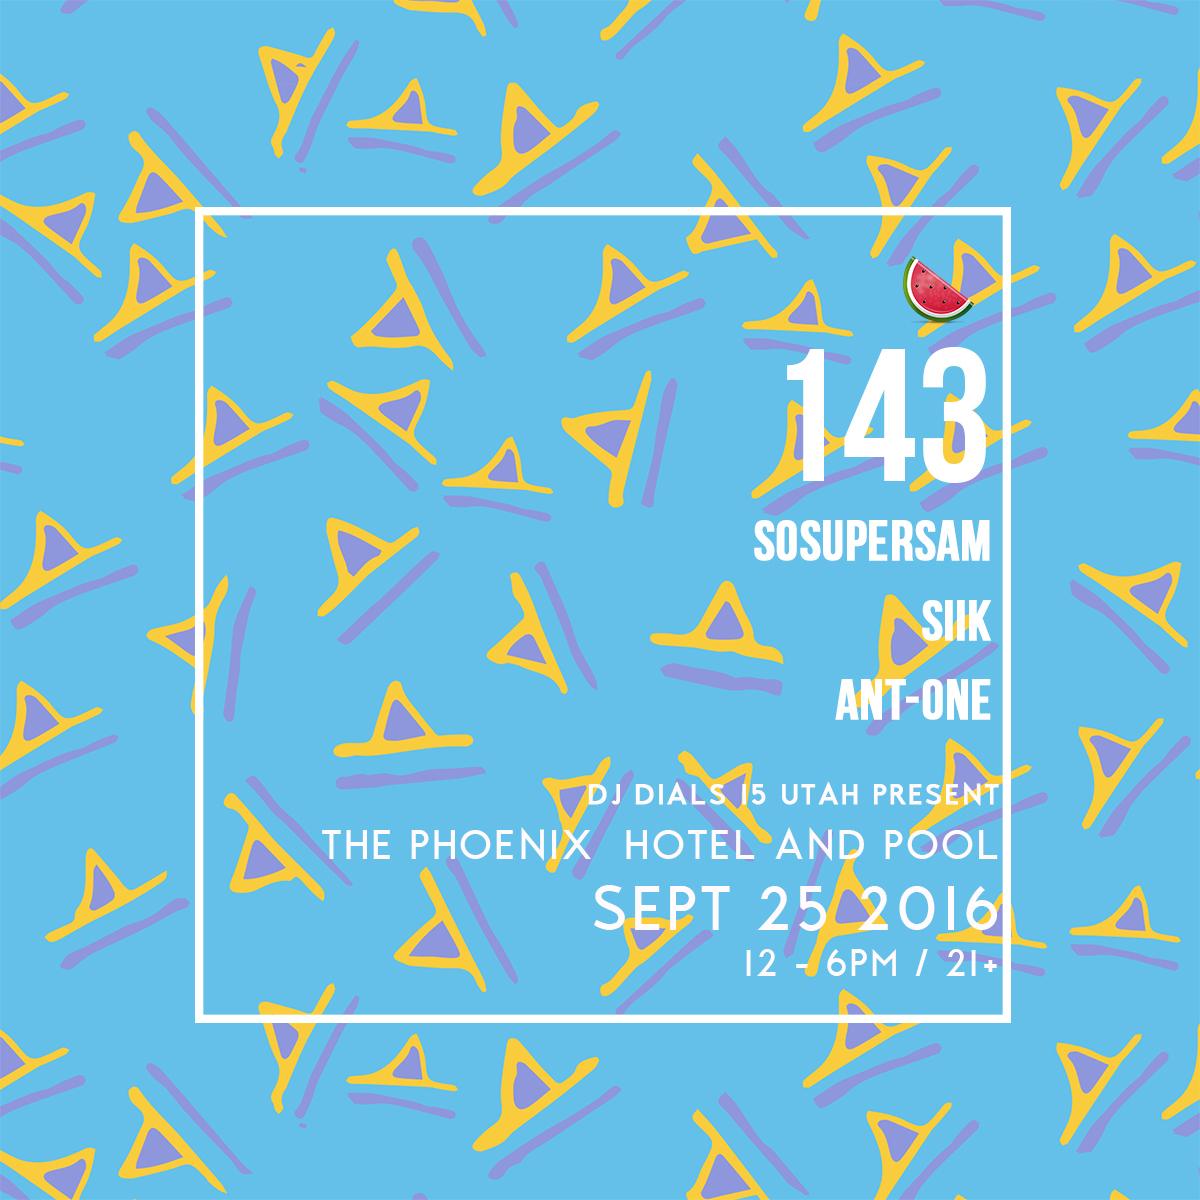 143 sosupersam sf dials